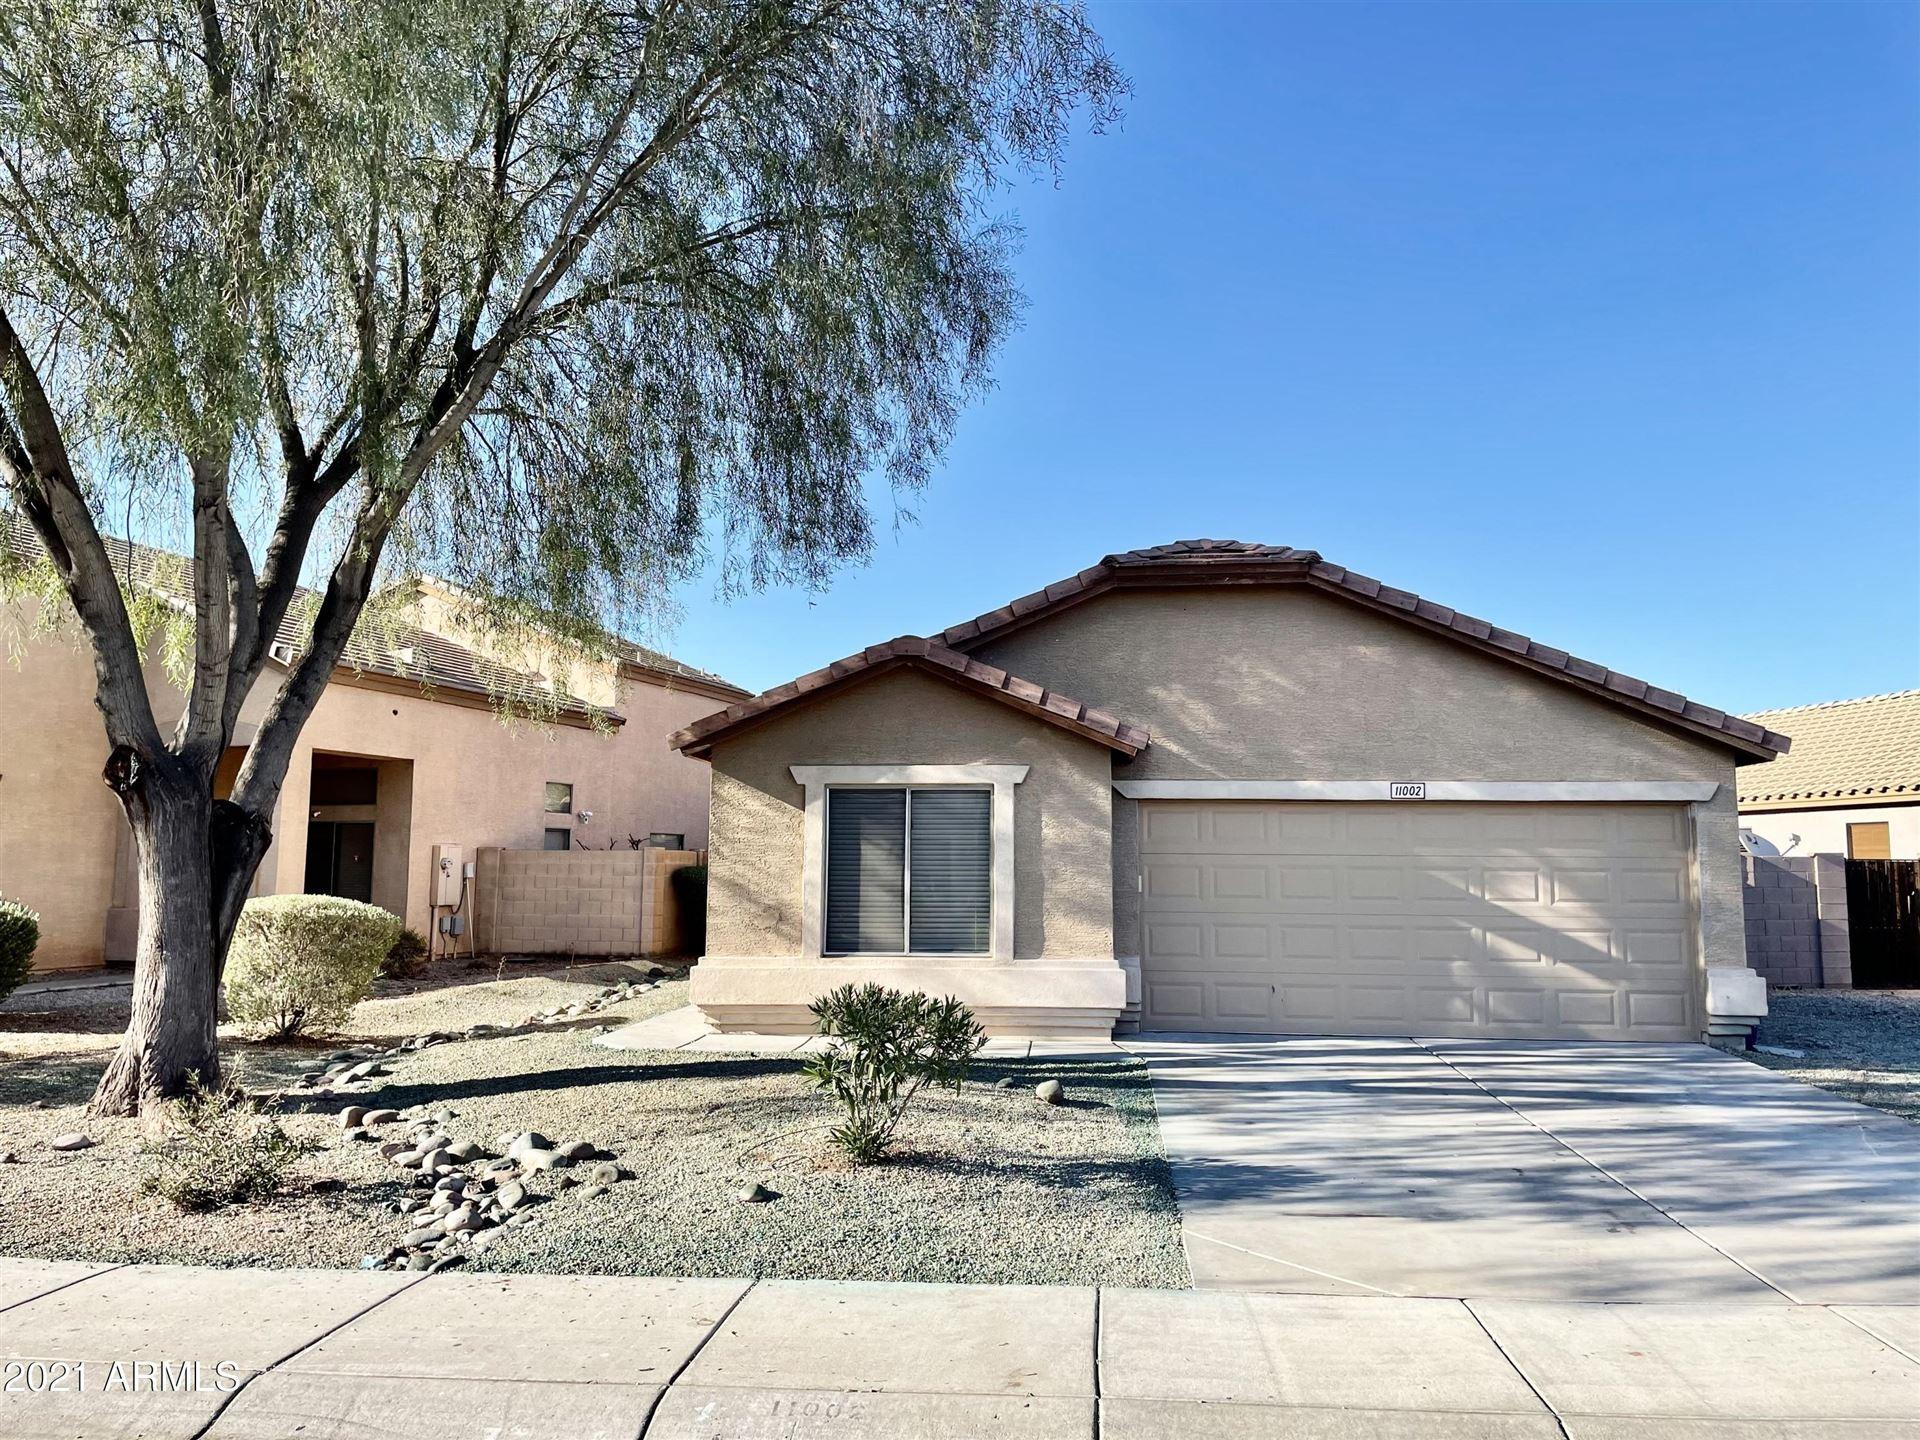 Photo of 11002 W WILSHIRE Drive, Avondale, AZ 85392 (MLS # 6249993)